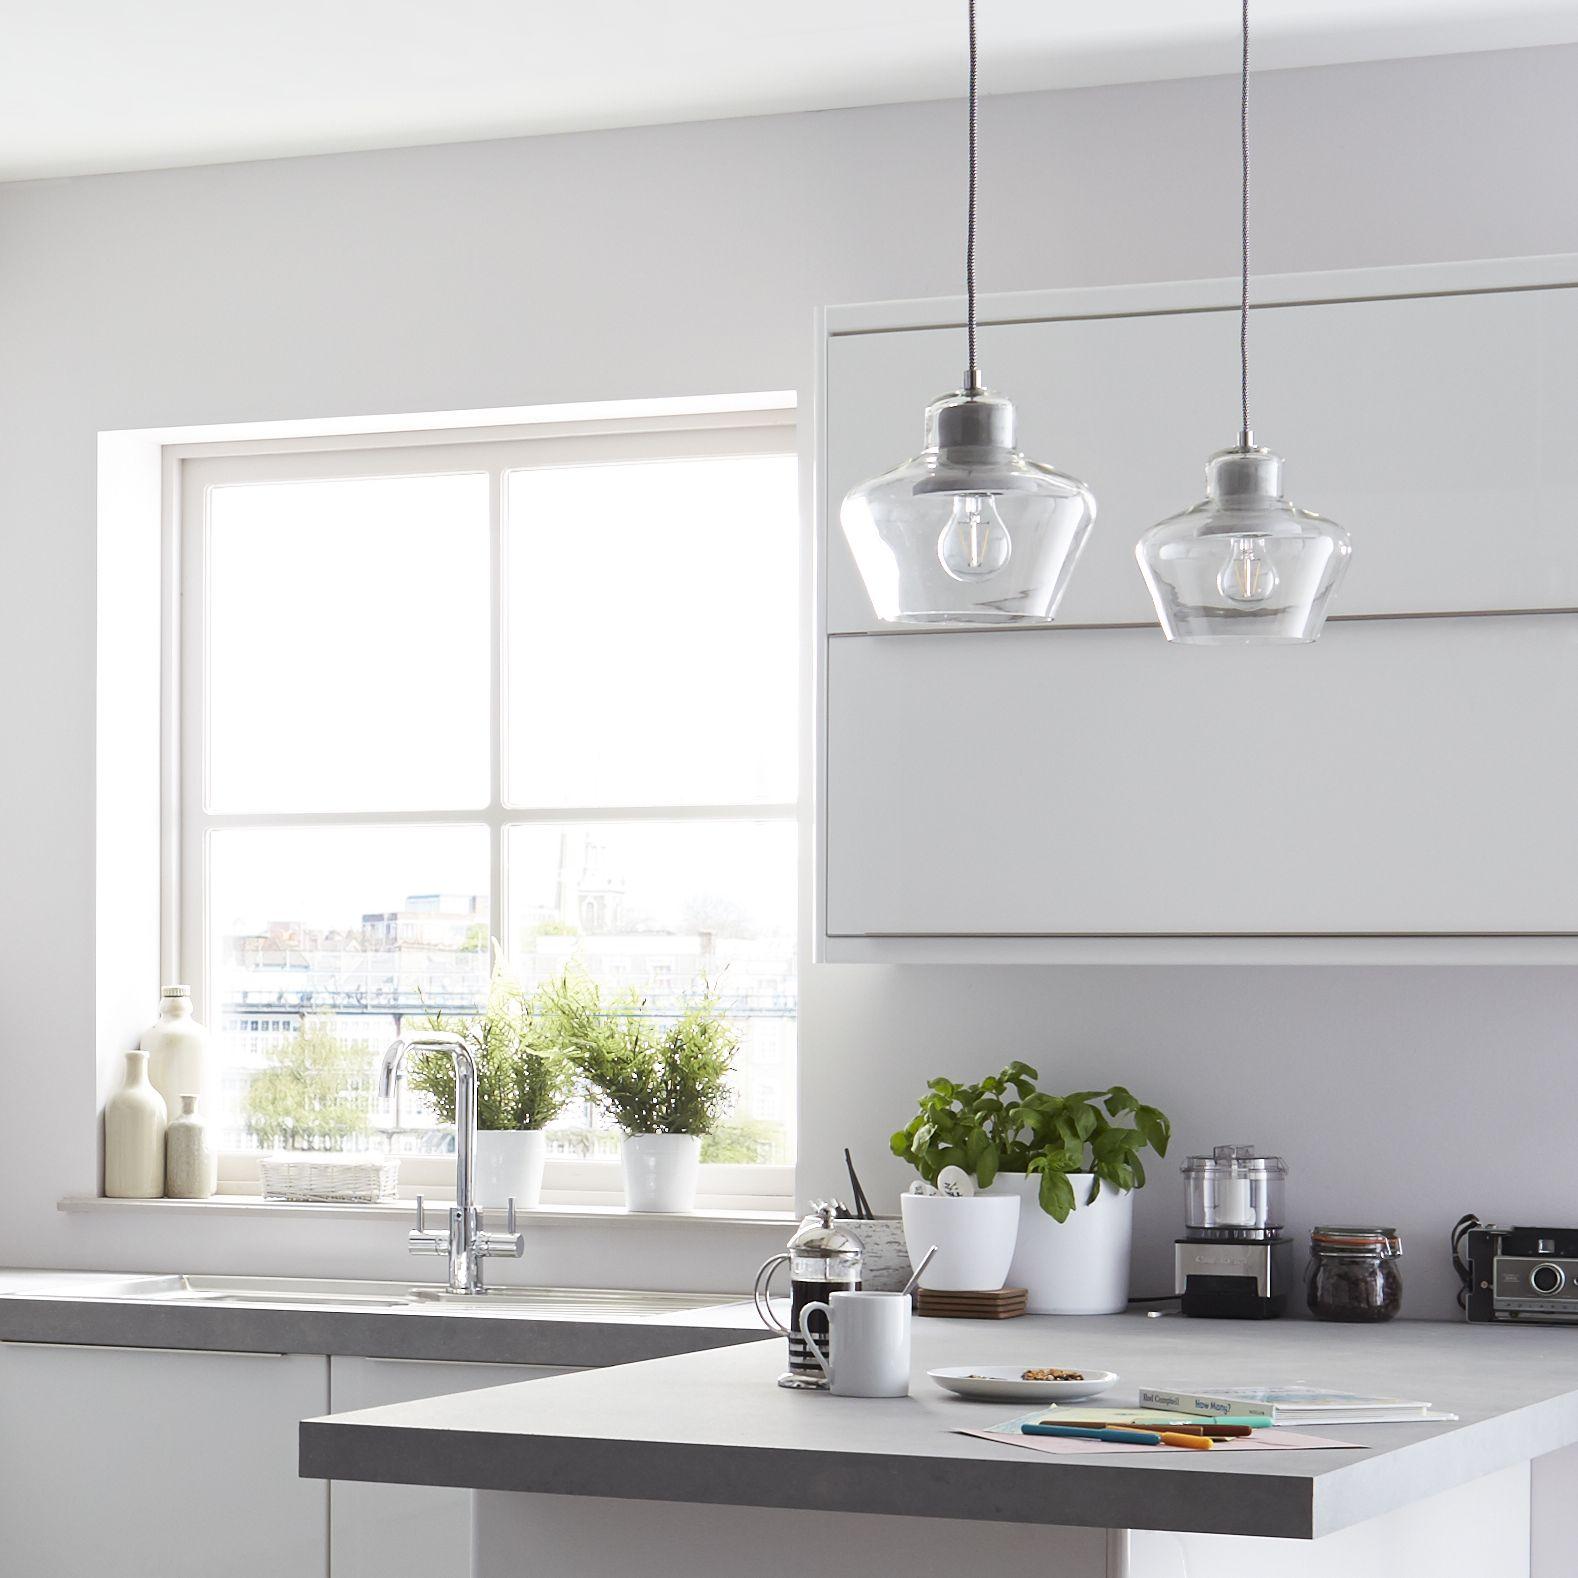 Glass pendant lights in the it santini white gloss slab kitchen